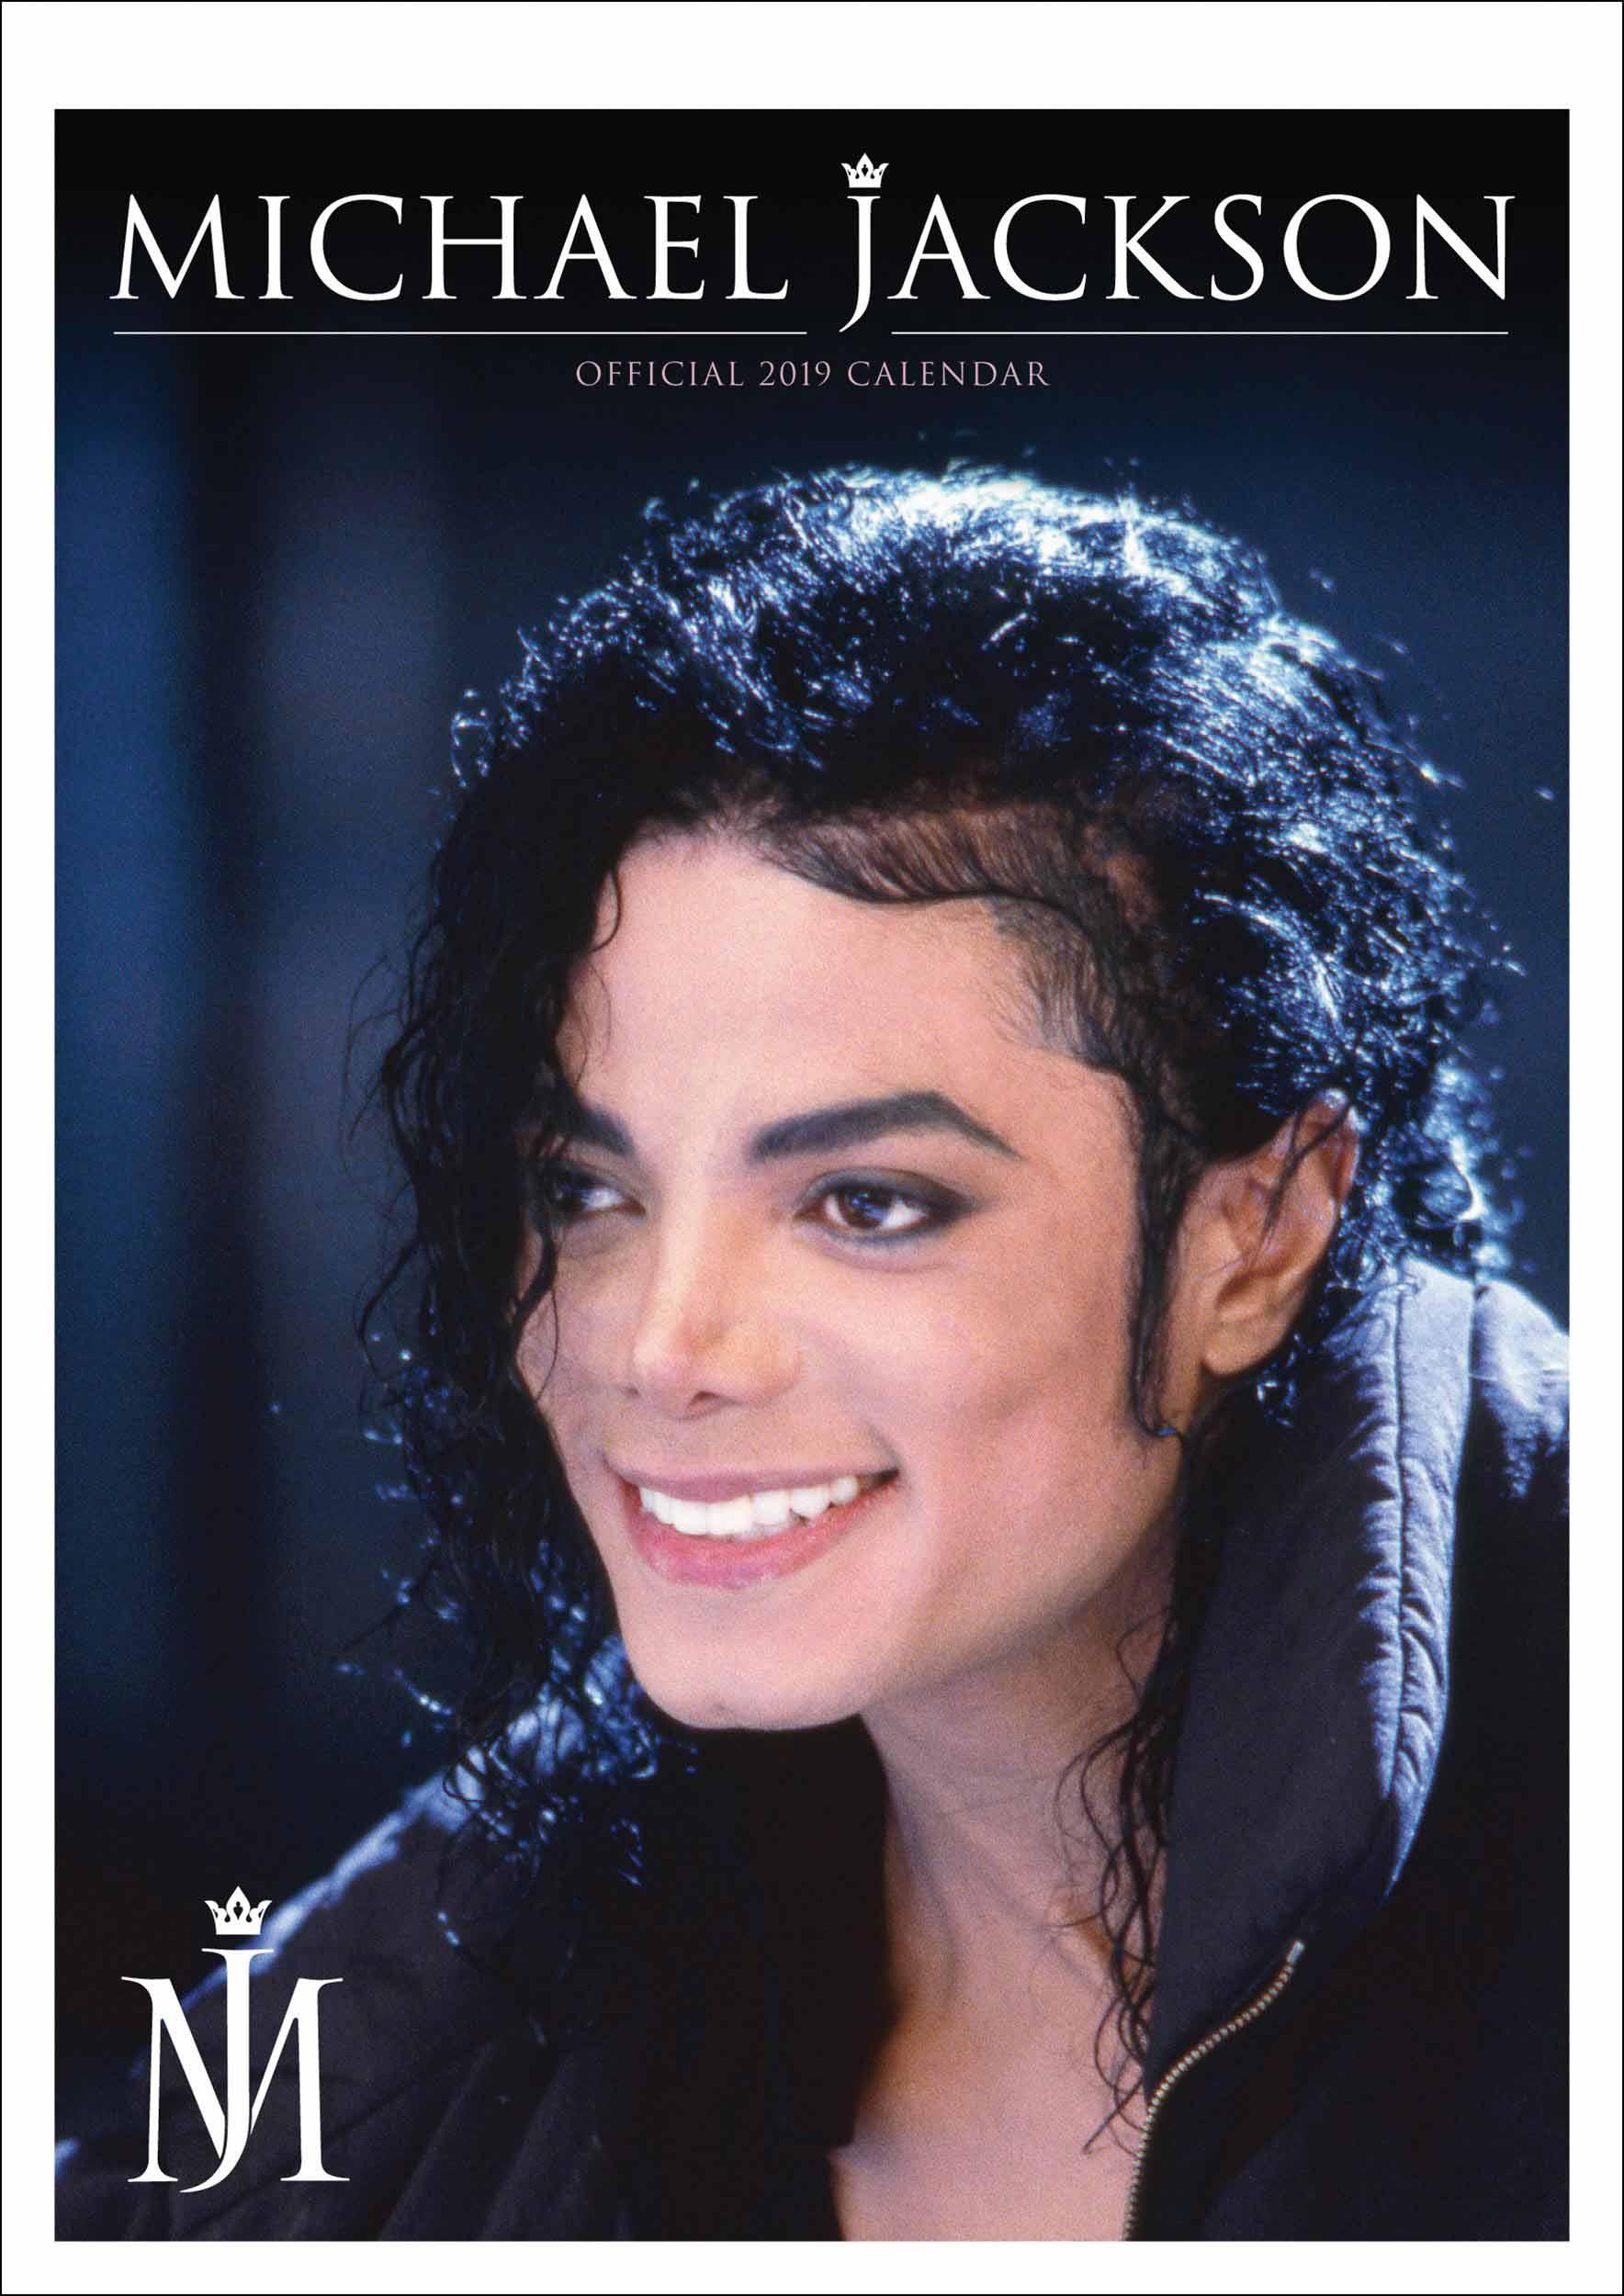 UK Official Michael Jackson 2019 Calendars